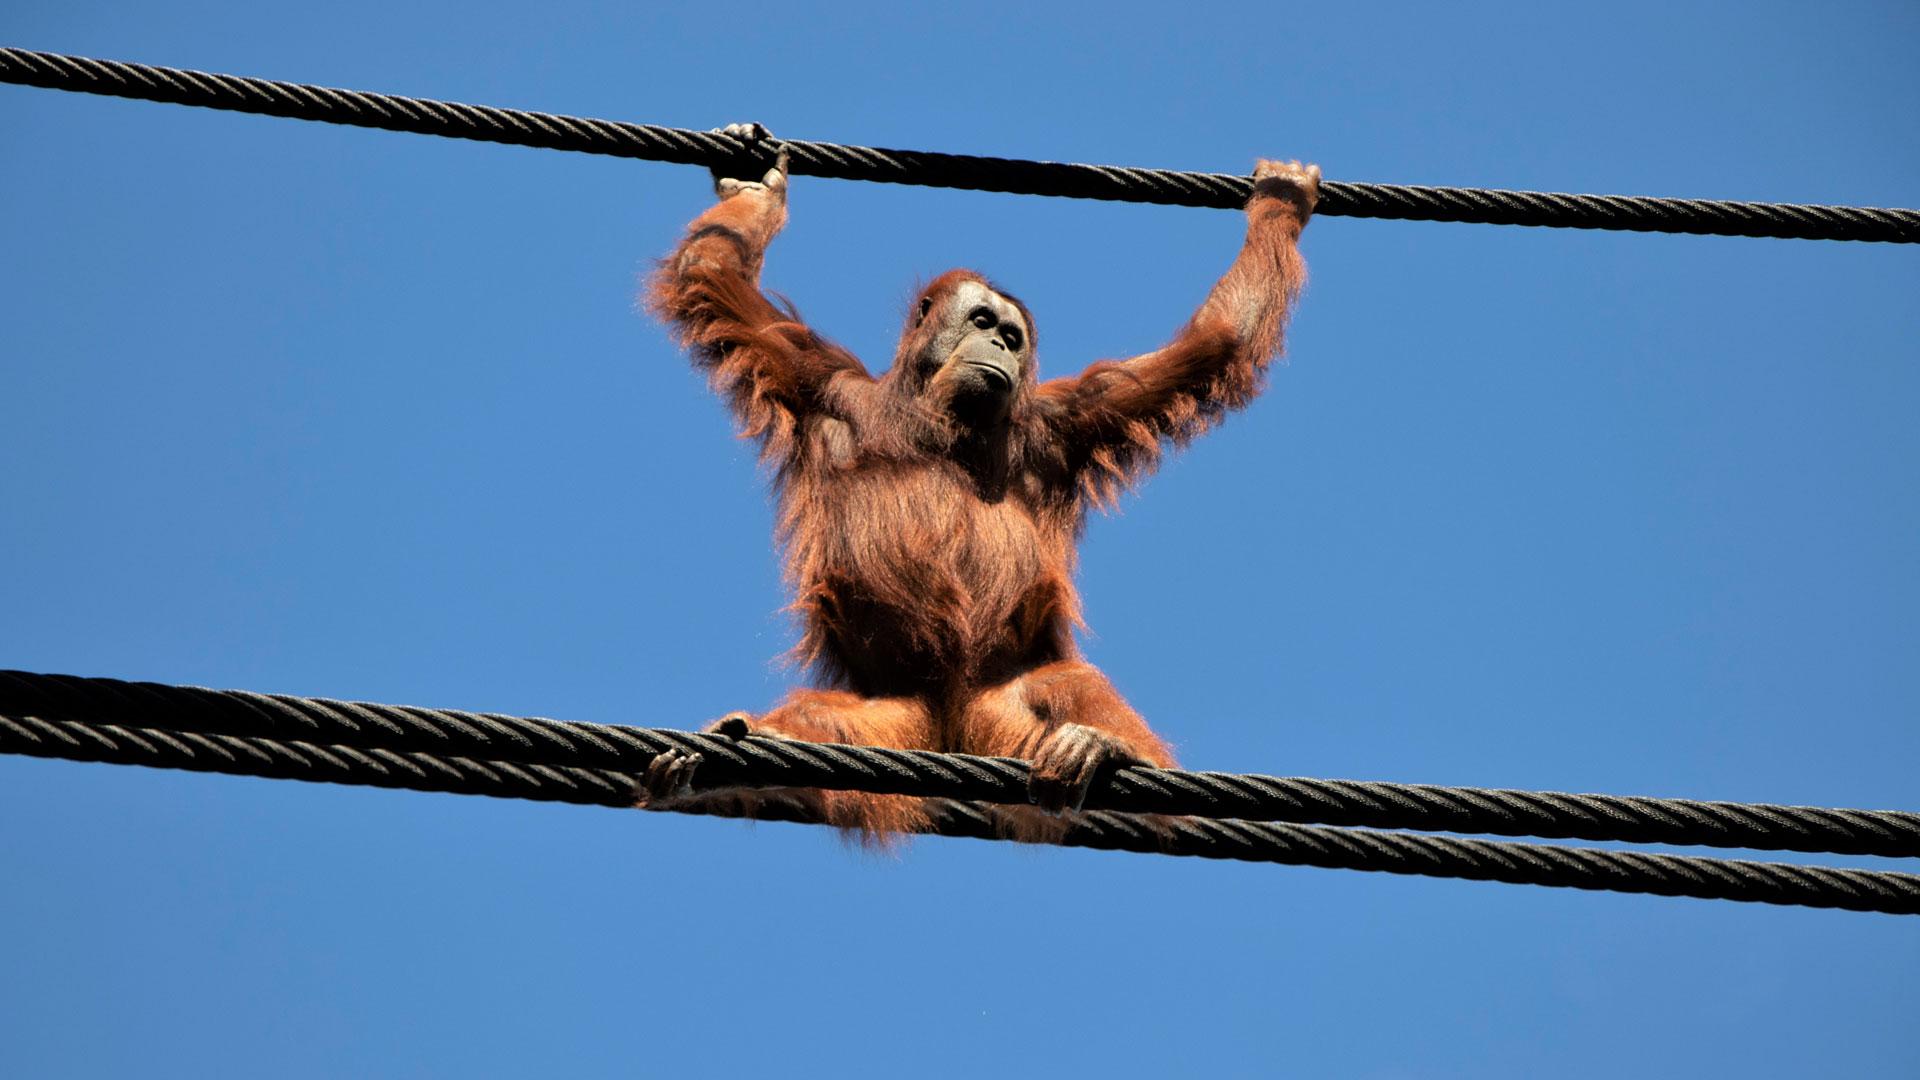 https://rfacdn.nz/zoo/assets/media/orangutans-aerial-pathways-gallery-1.jpg